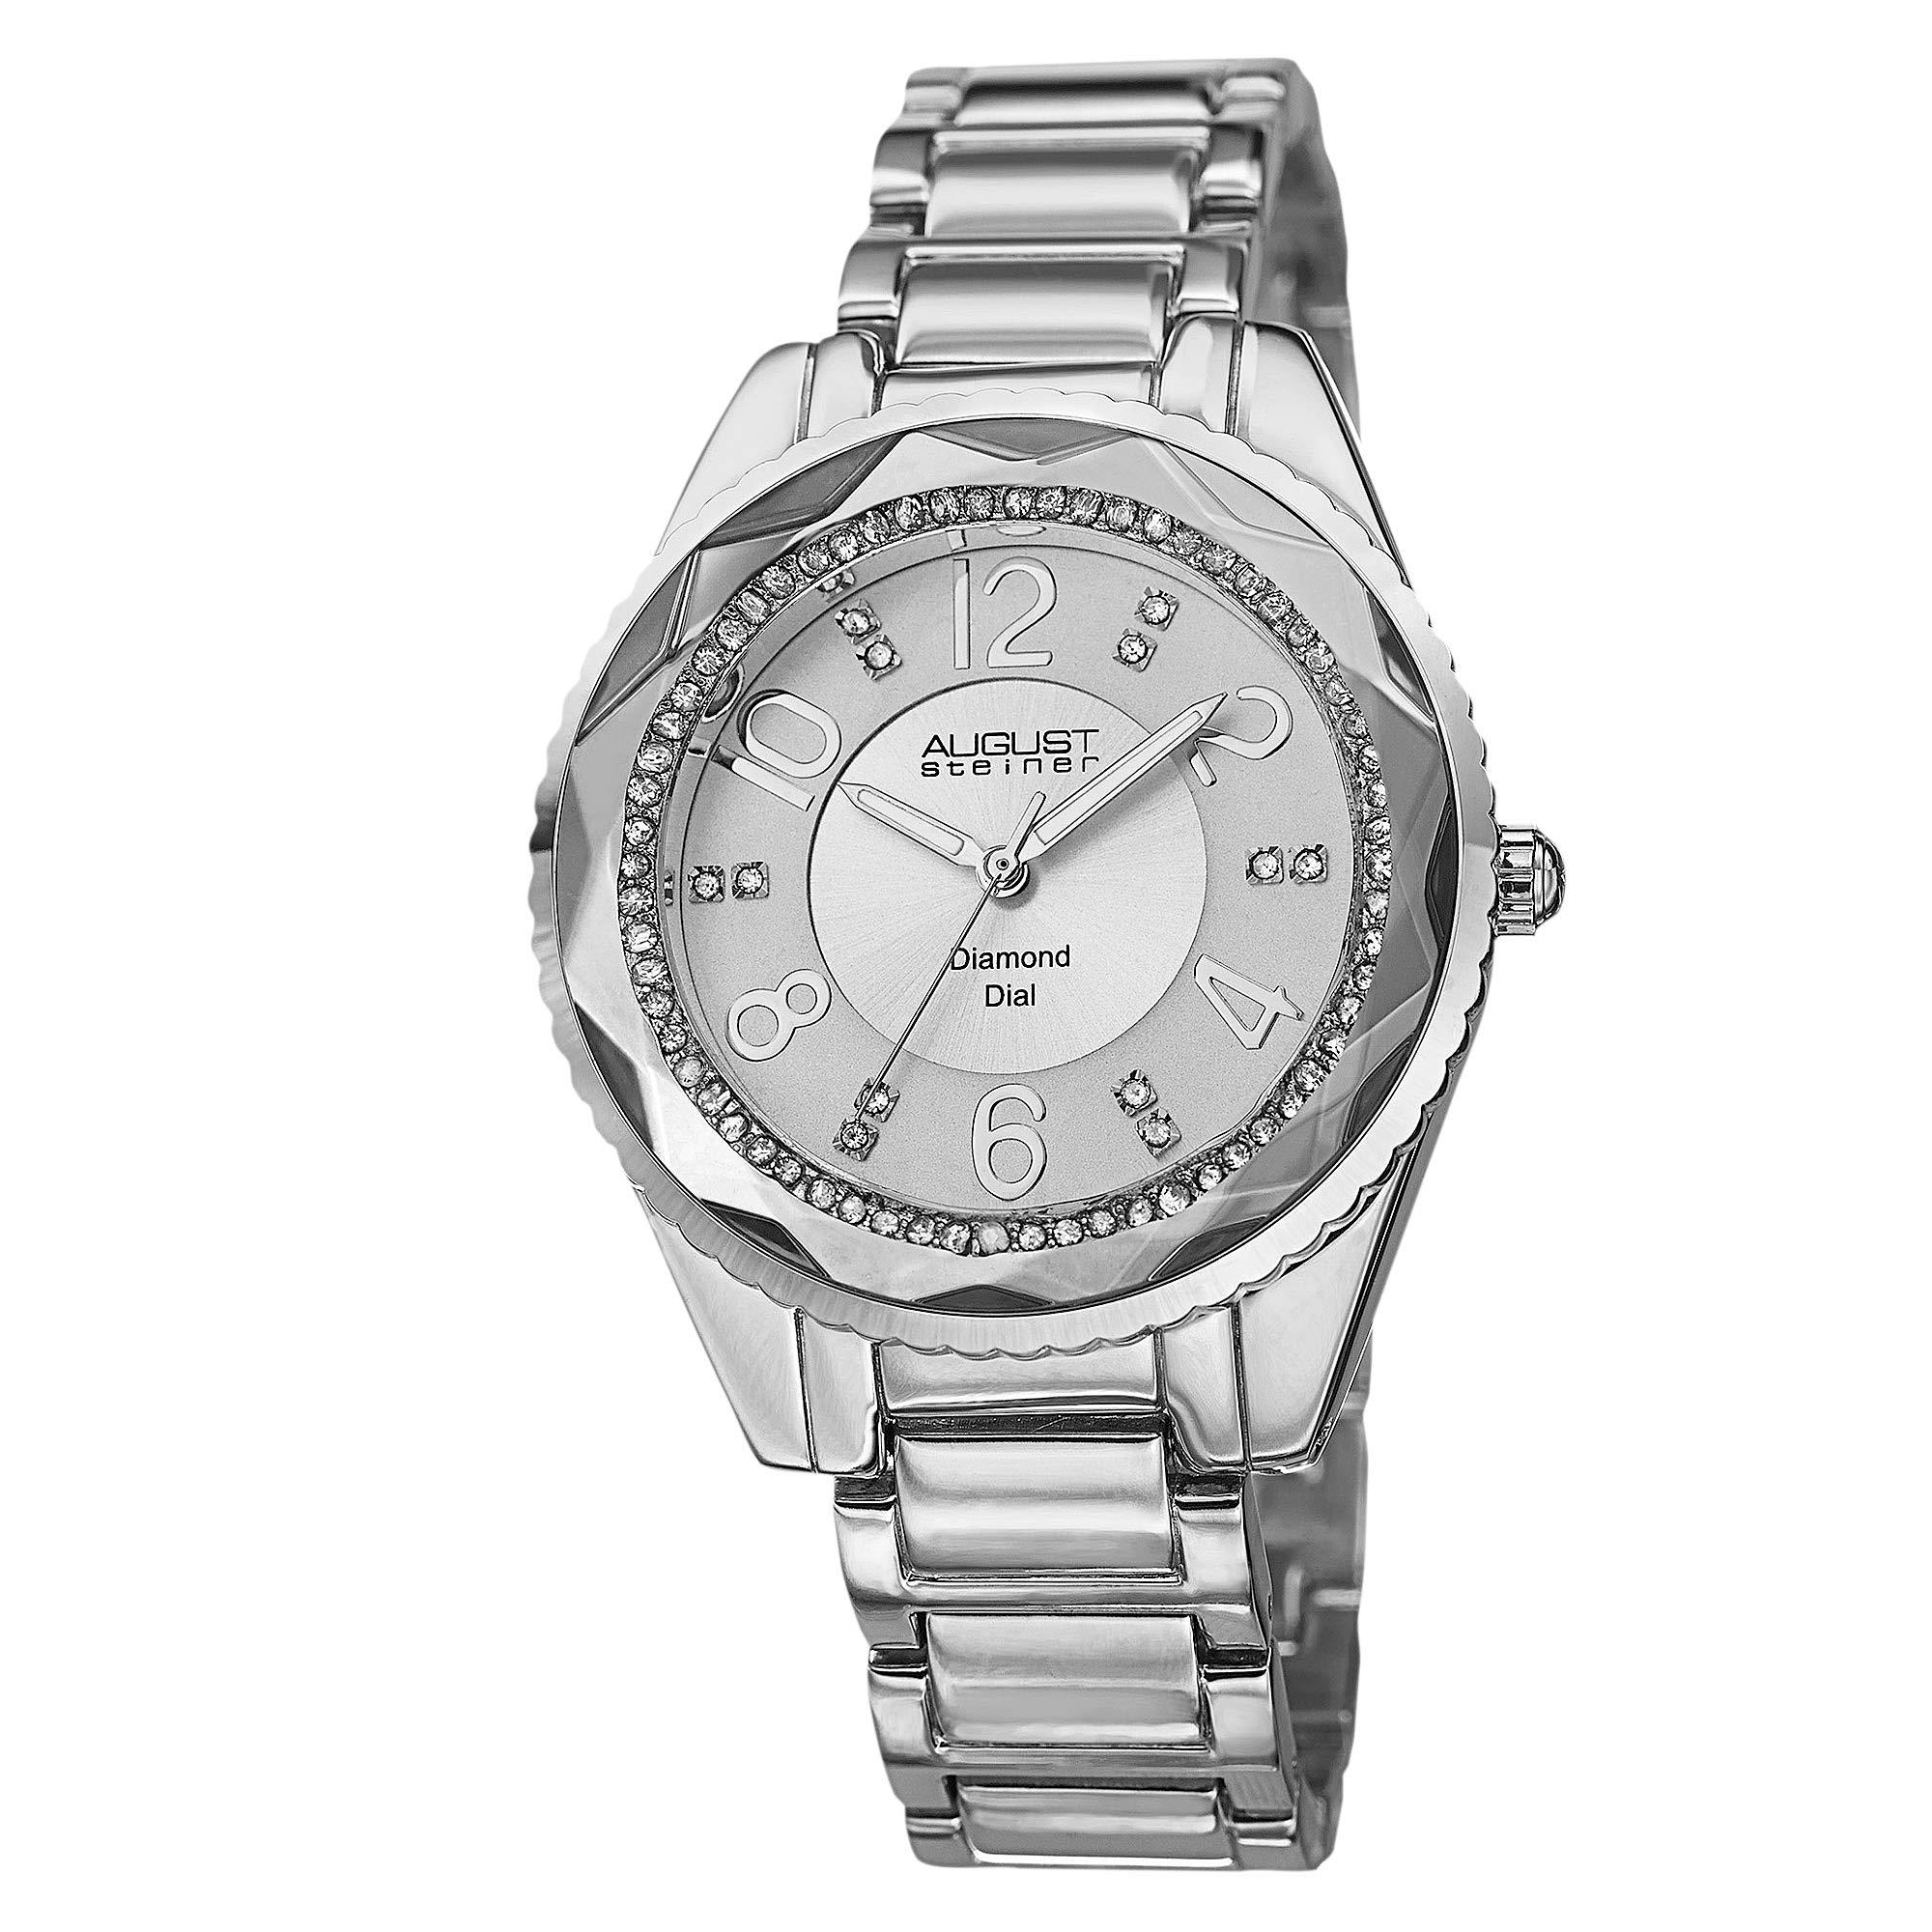 Women's Diamond Watch - 12 Genuine Diamond and Arabic Numeral Hour Markers On A Bracelet Watch - AS8122